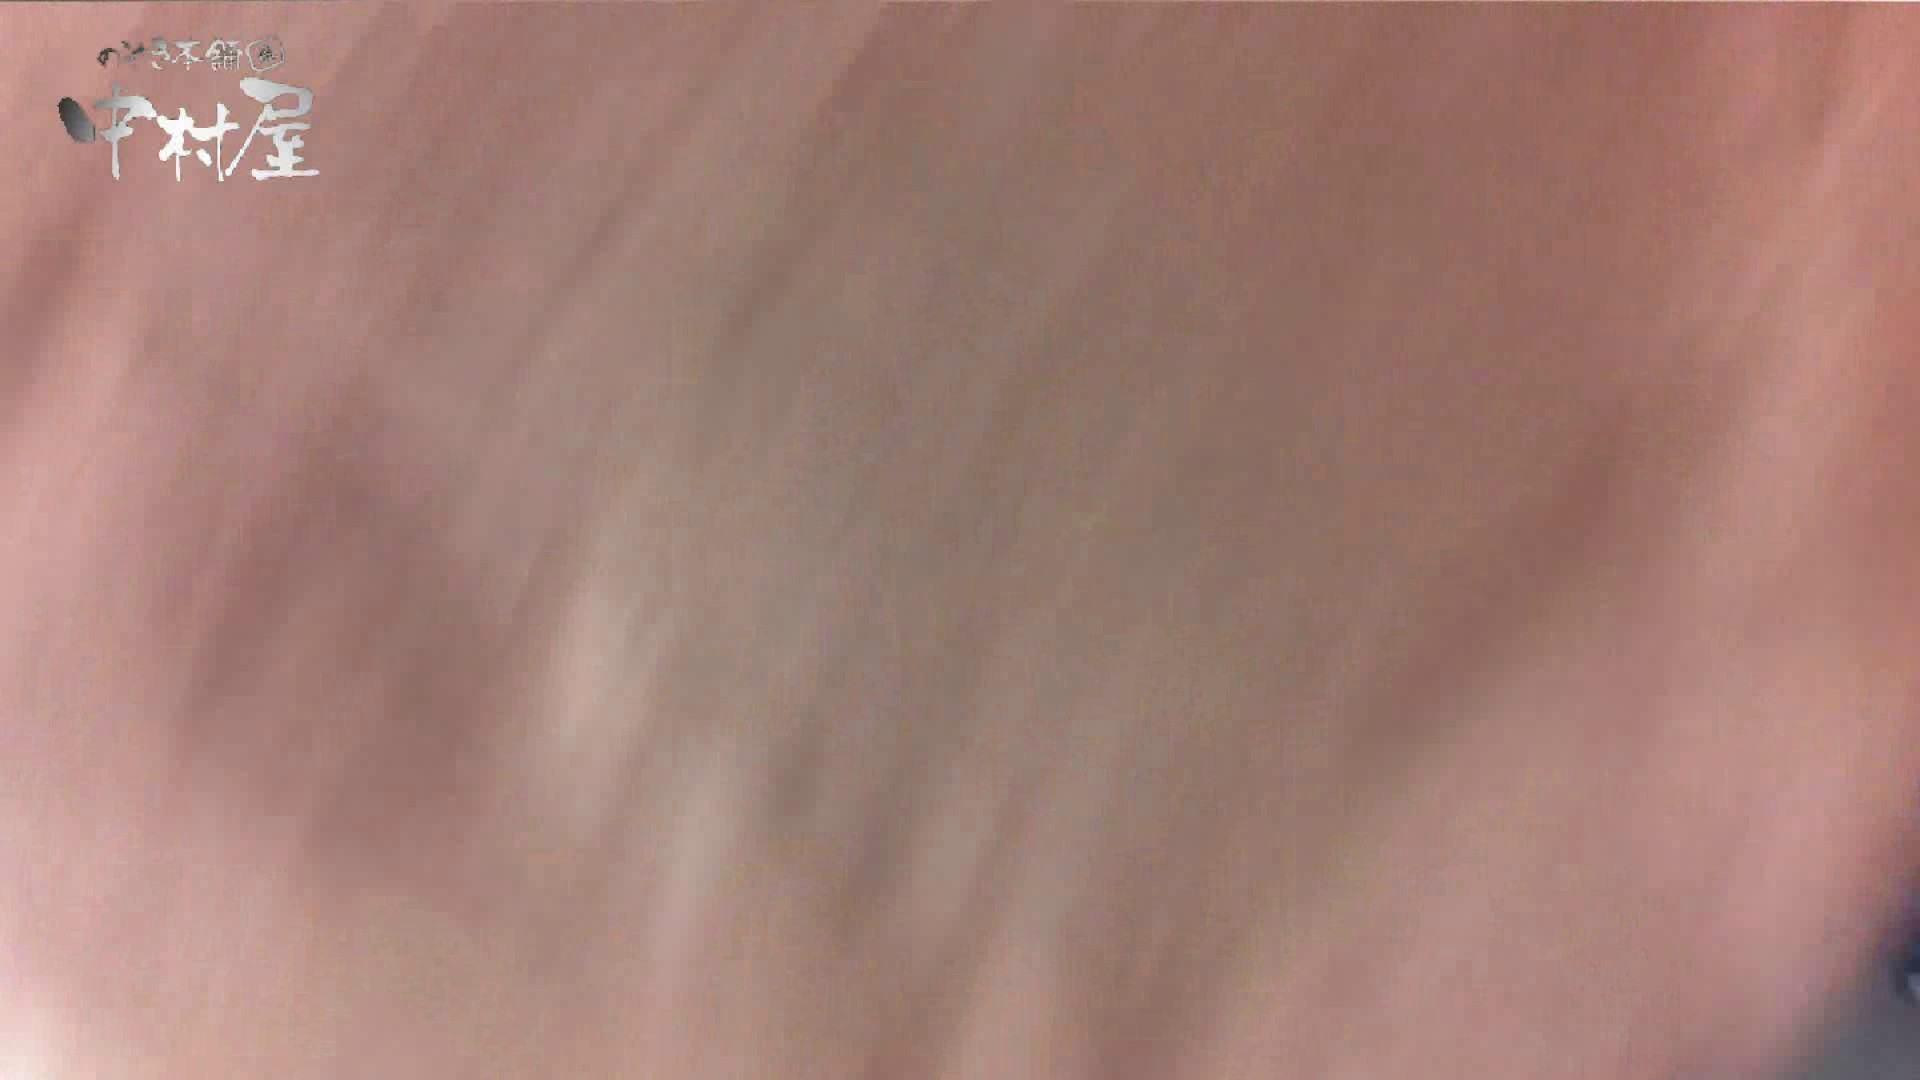 vol.45 可愛いカリスマ店員限定‼胸チラ&パンチラ 食い込みミッキーマウス! チラ見せヌード アダルト動画キャプチャ 103画像 32